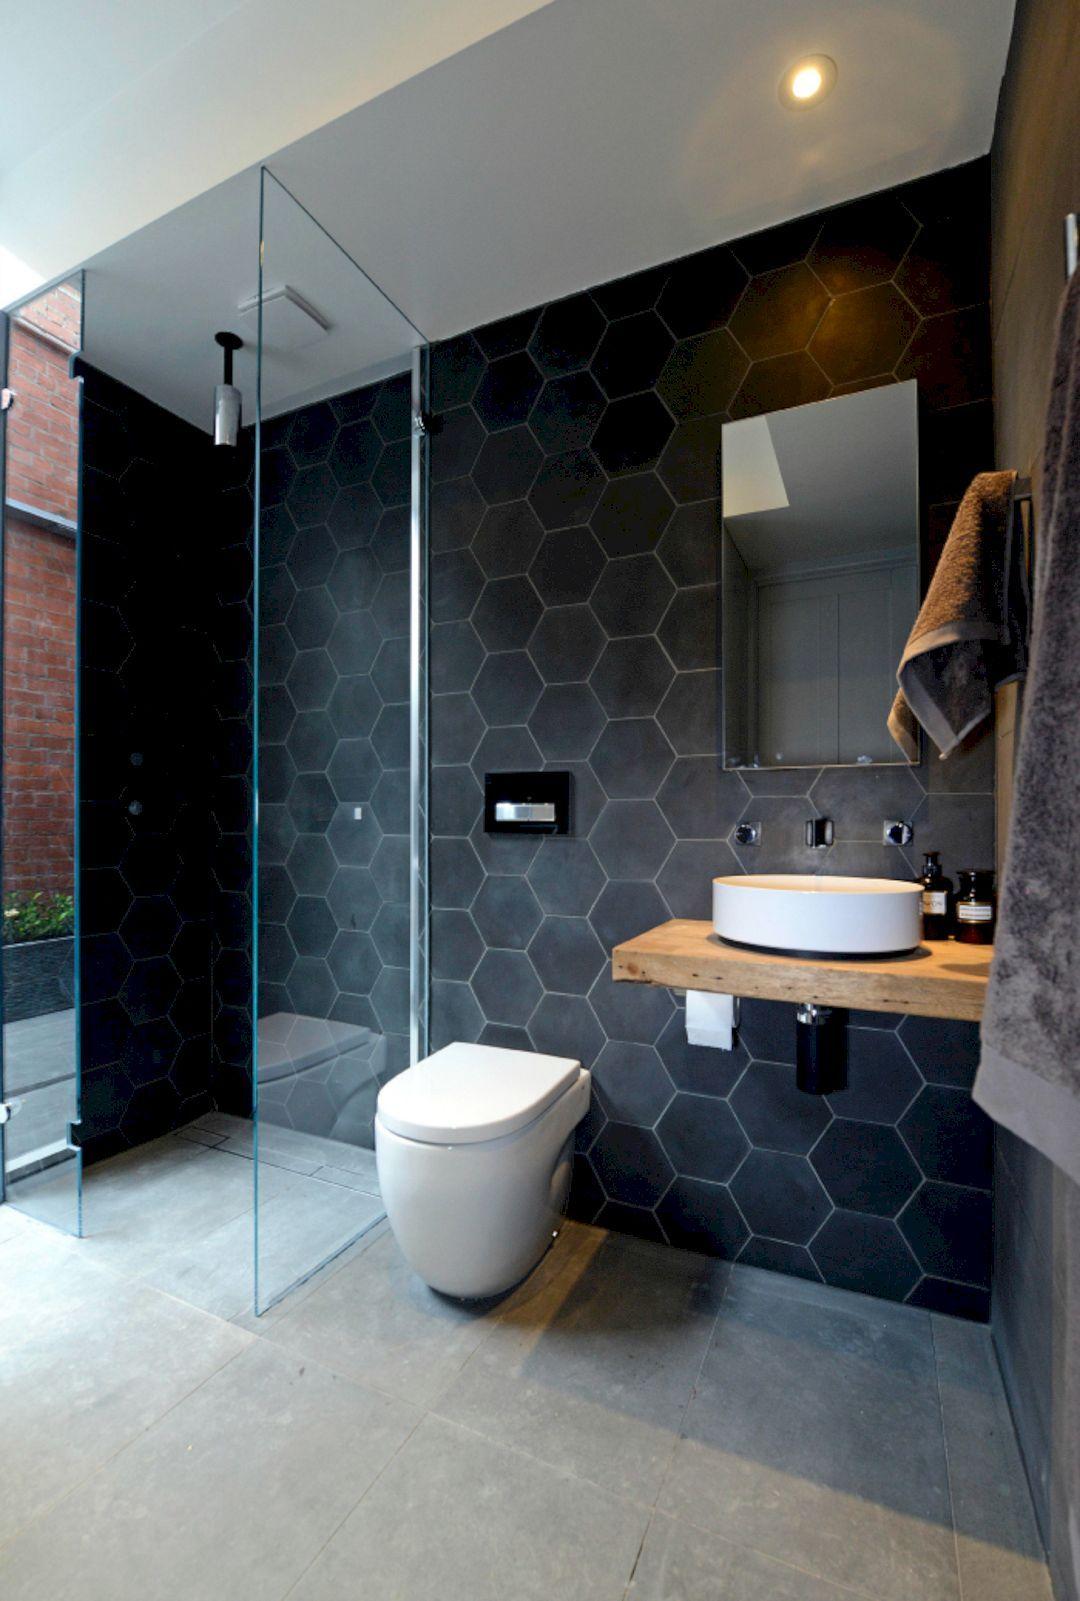 16 Small Bathroom Renovation Ideas Small Bathroom Remodel Designs Small Bathroom Remodel Bathroom Trends